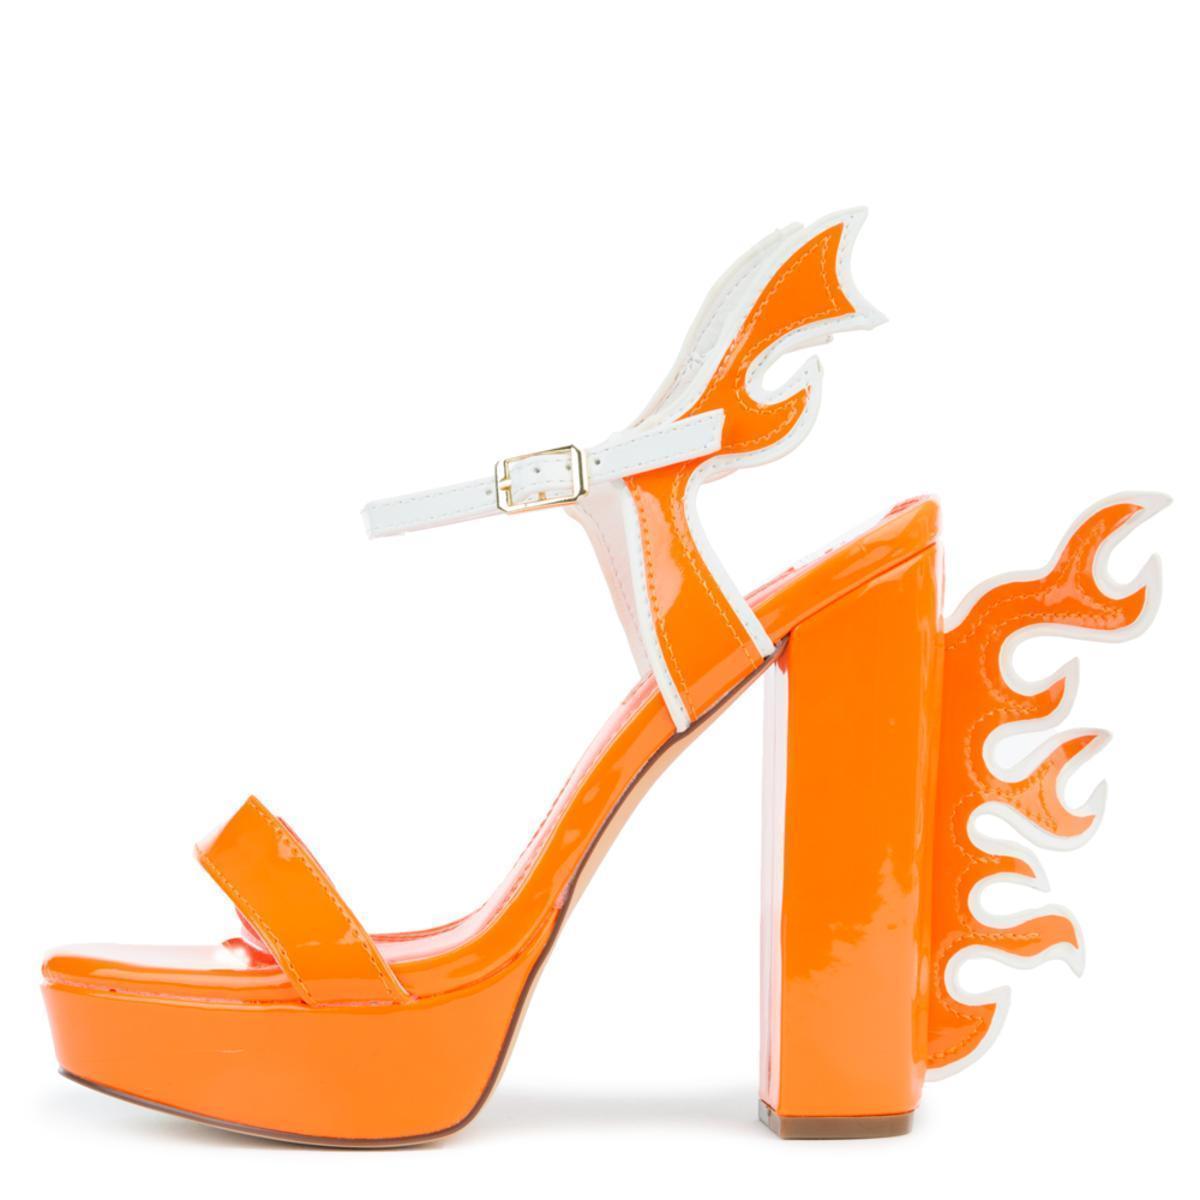 71cc5fba7aea LILIANAS SHOES - Orange Chunky Heel With Flames - Lyst. View fullscreen